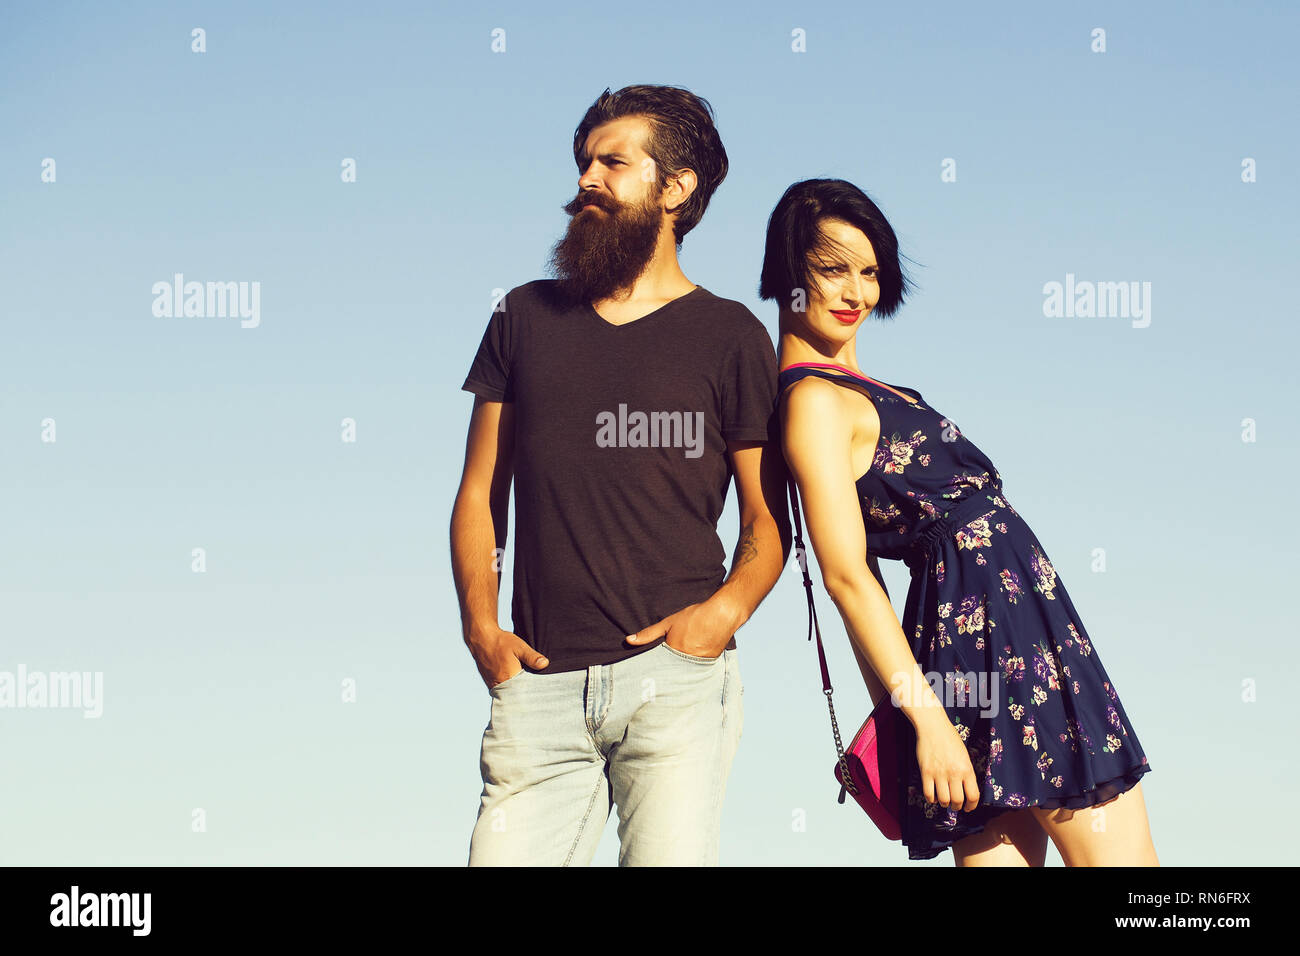 Couple pose on blue sky - Stock Image